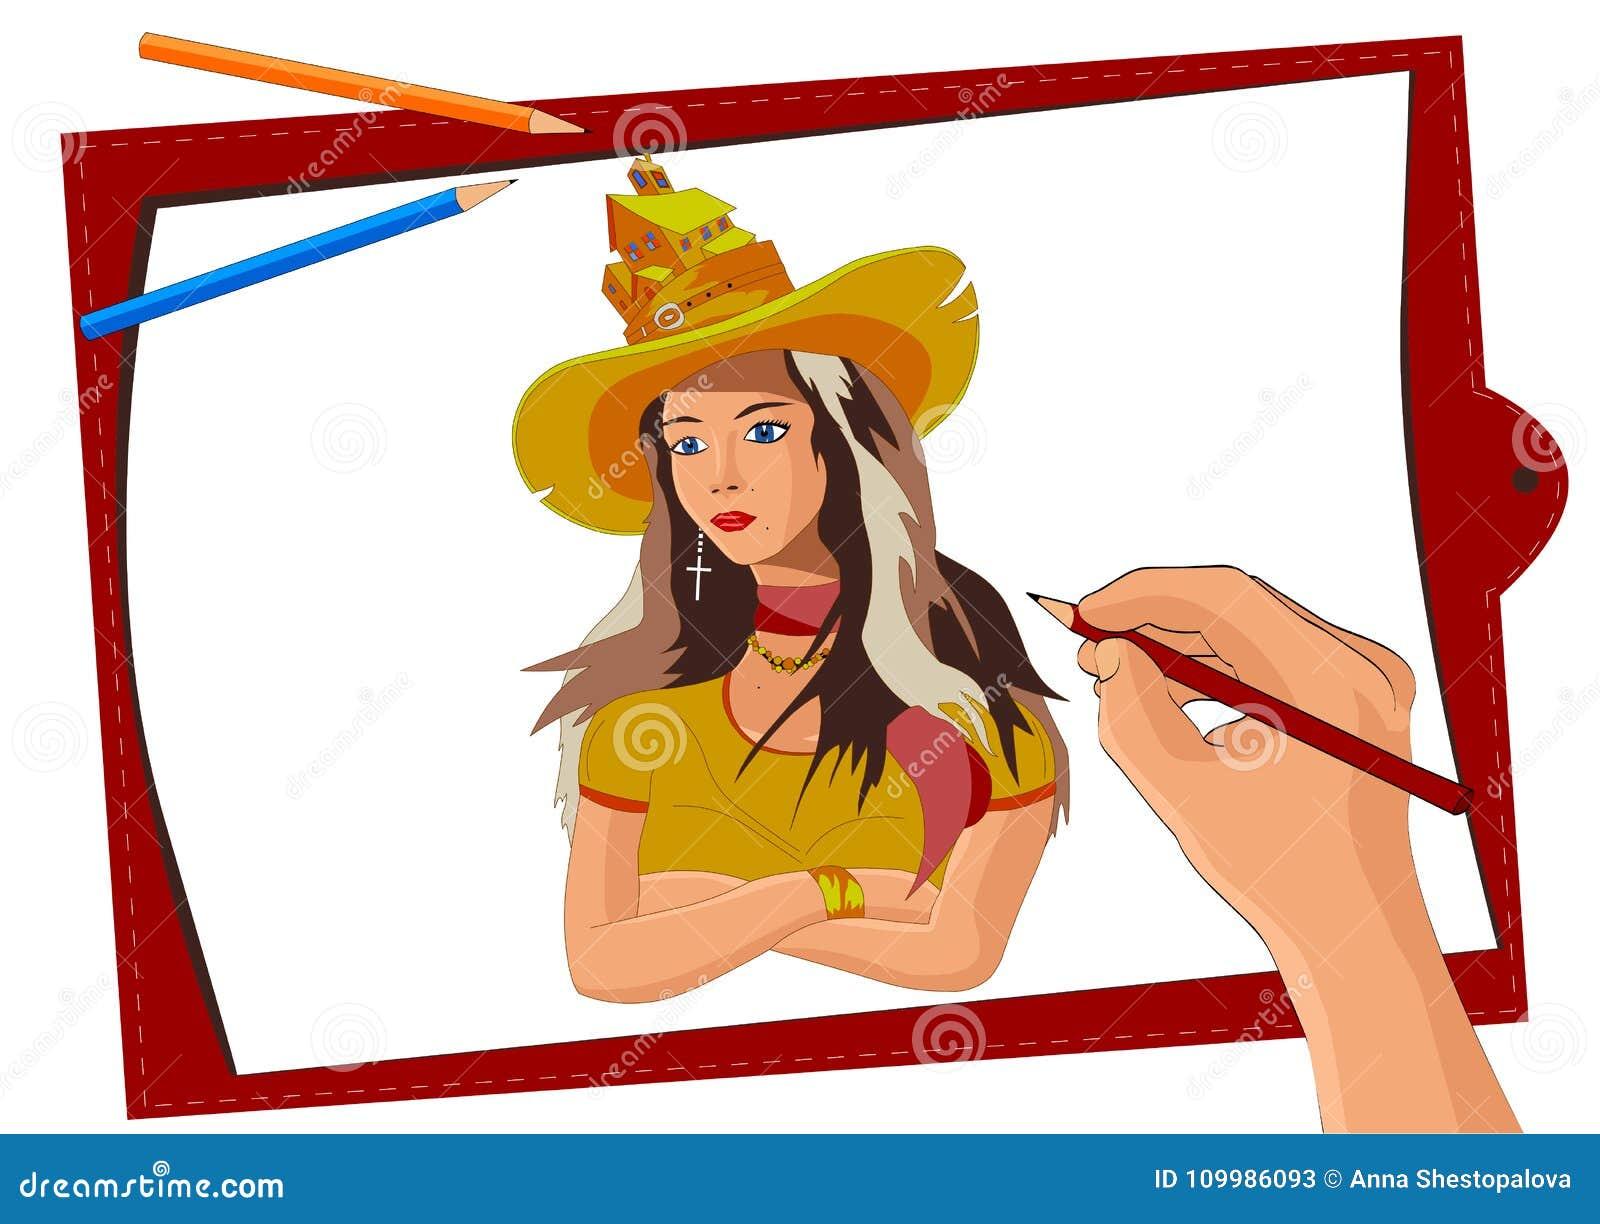 e263a2c1f04 Artist draws girl hat vector picture process drawing pencils landscape  sheet vector illustration image jpg 1300x1011